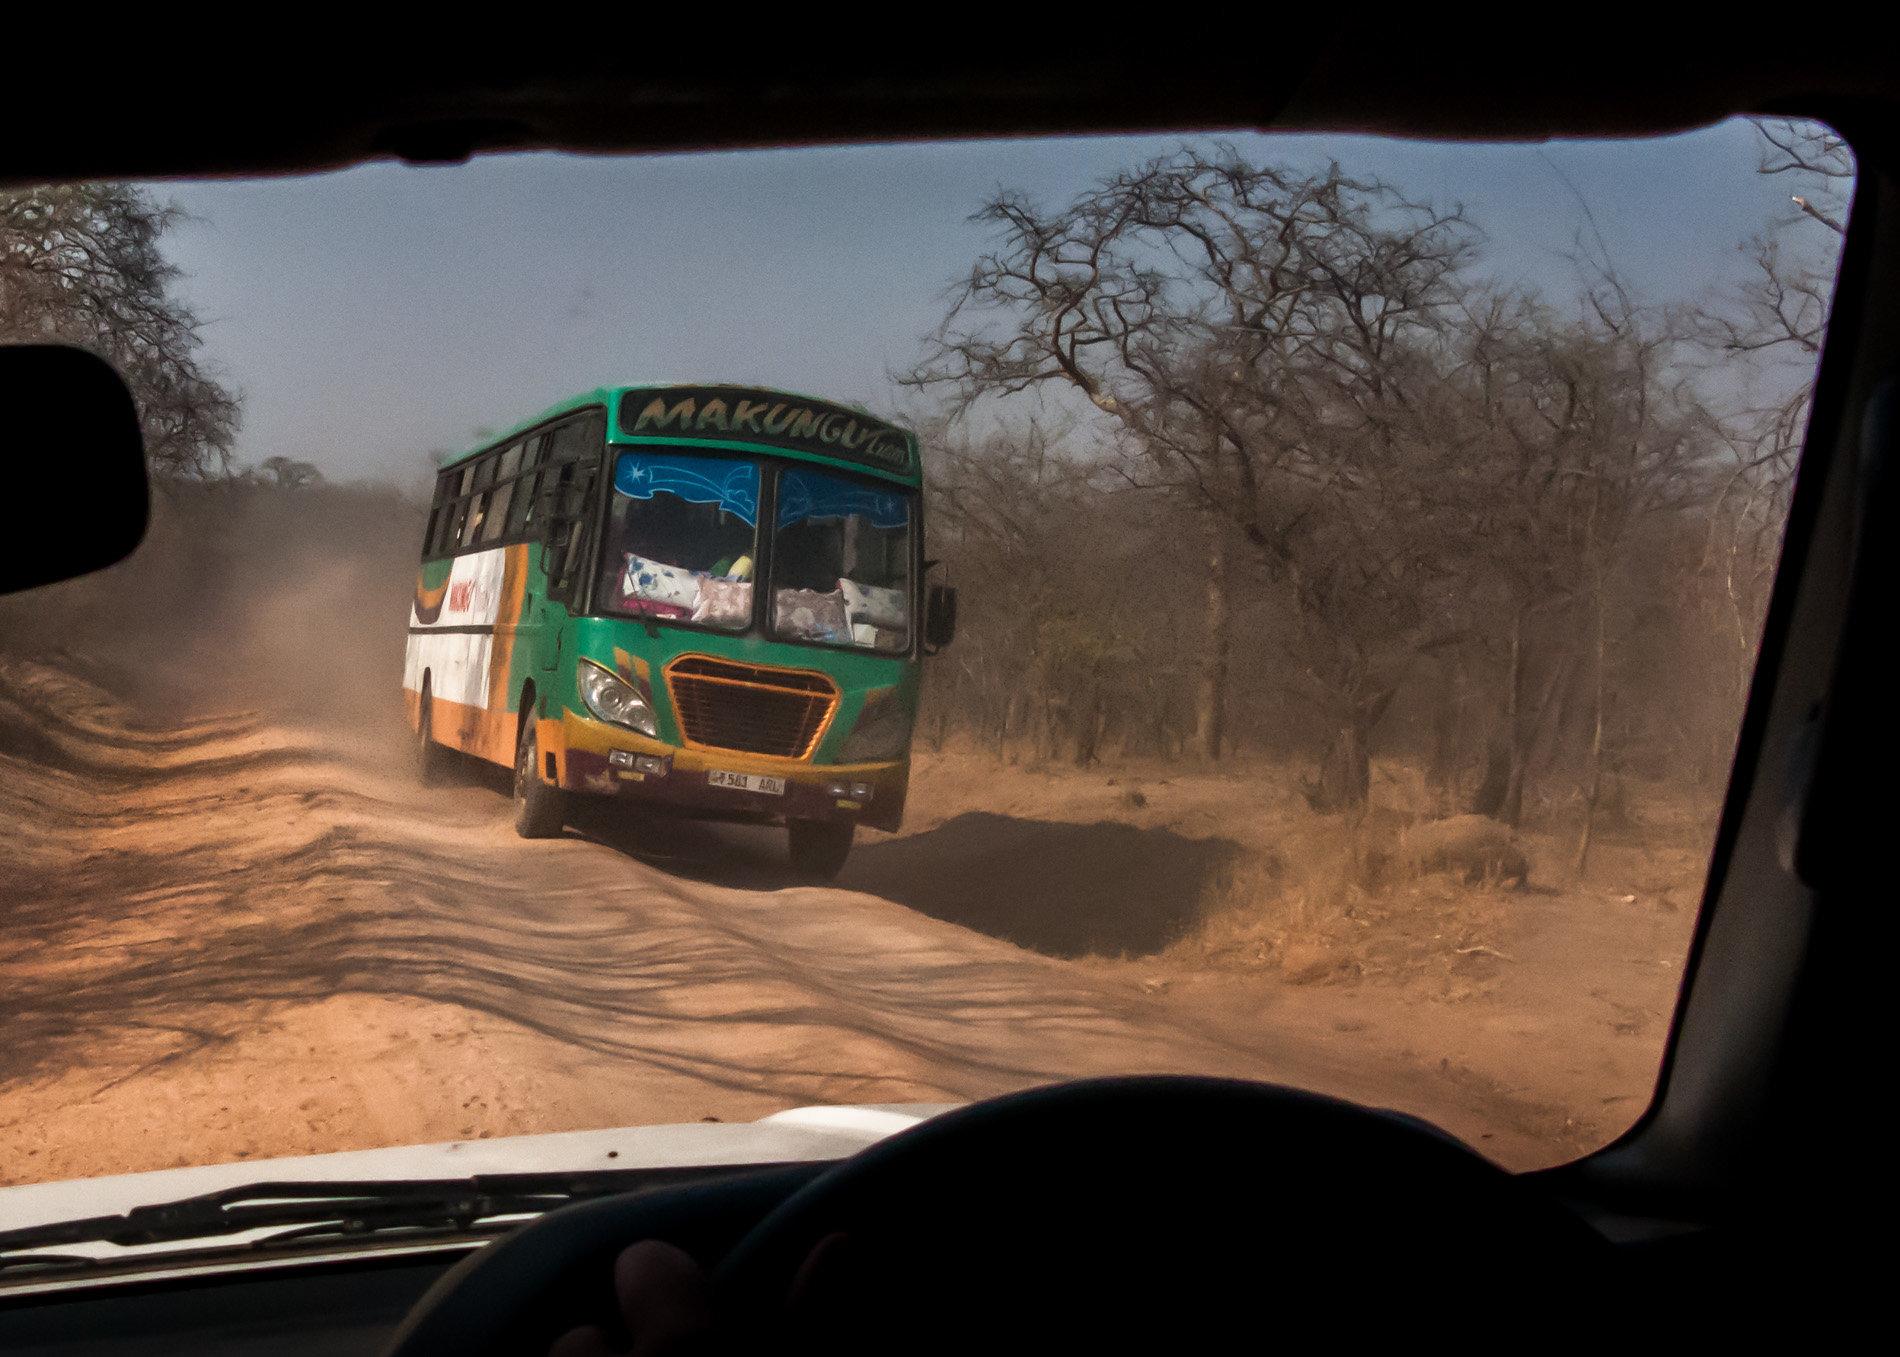 Tanzania,_Back_Seat_View-1699.jpg